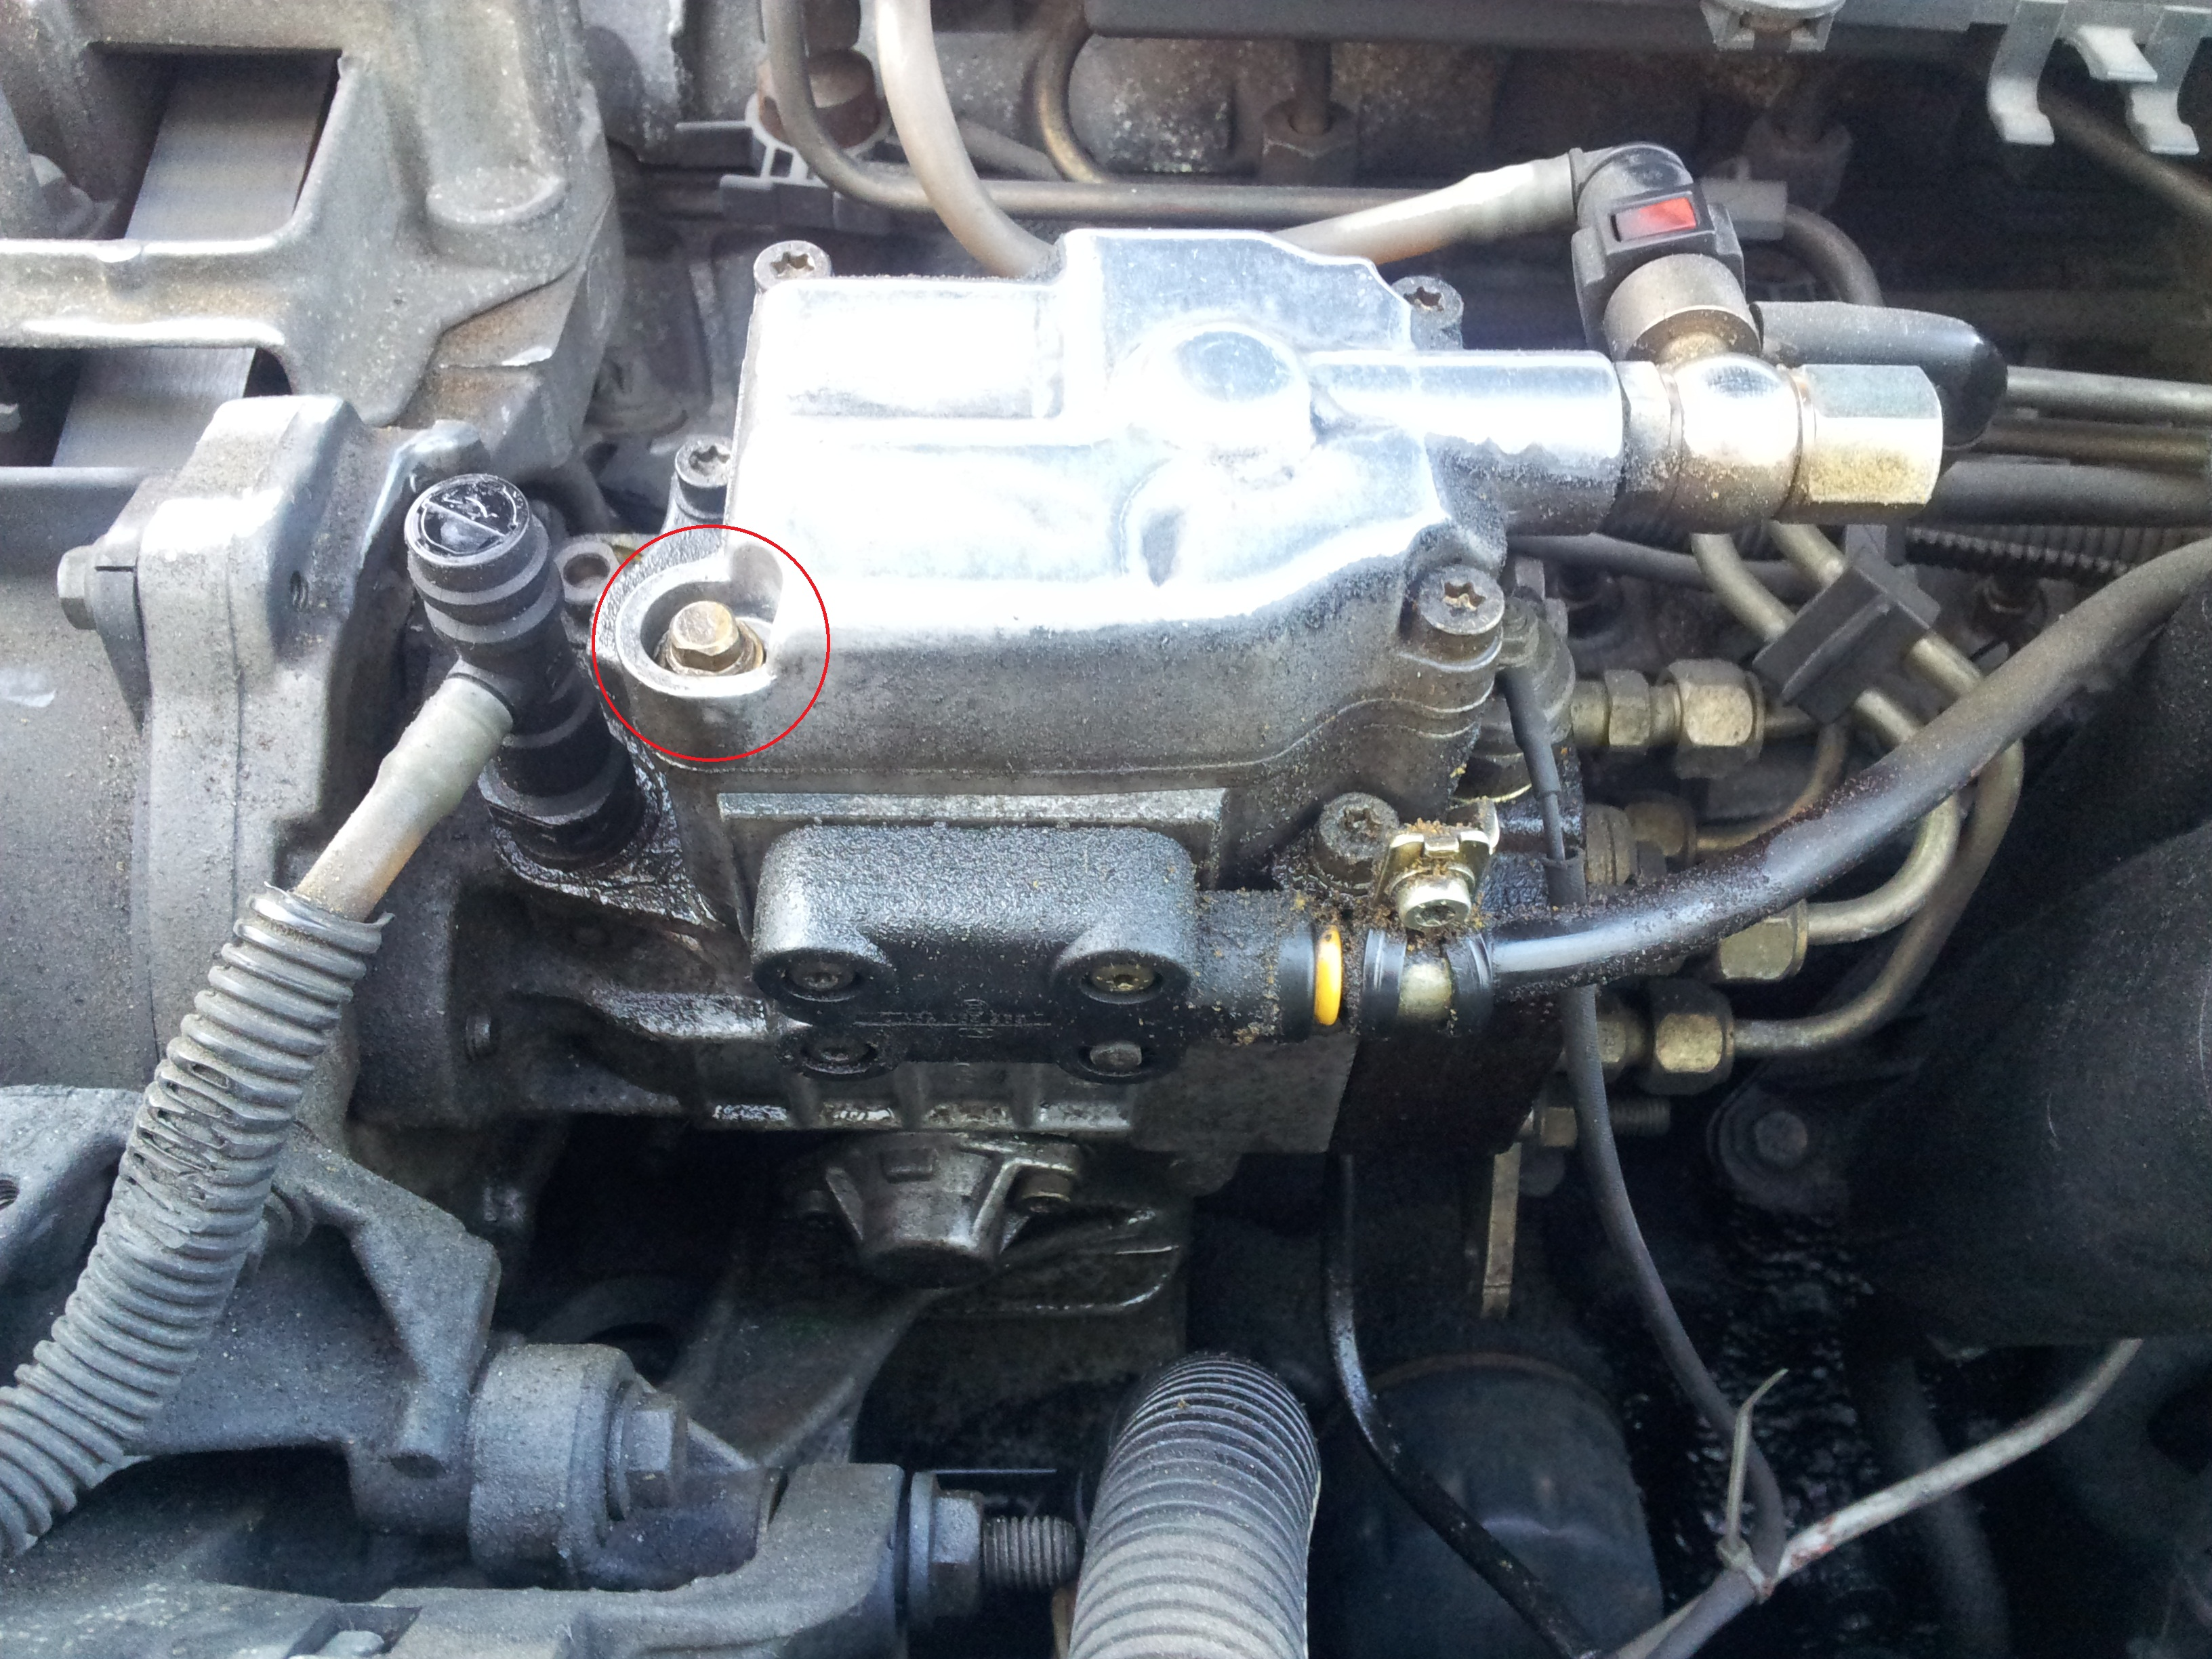 Modne ubrania Megane I phII] Cieknąca pompa paliwa 1.9dTi - 1.9 diesel - FORUM SD34